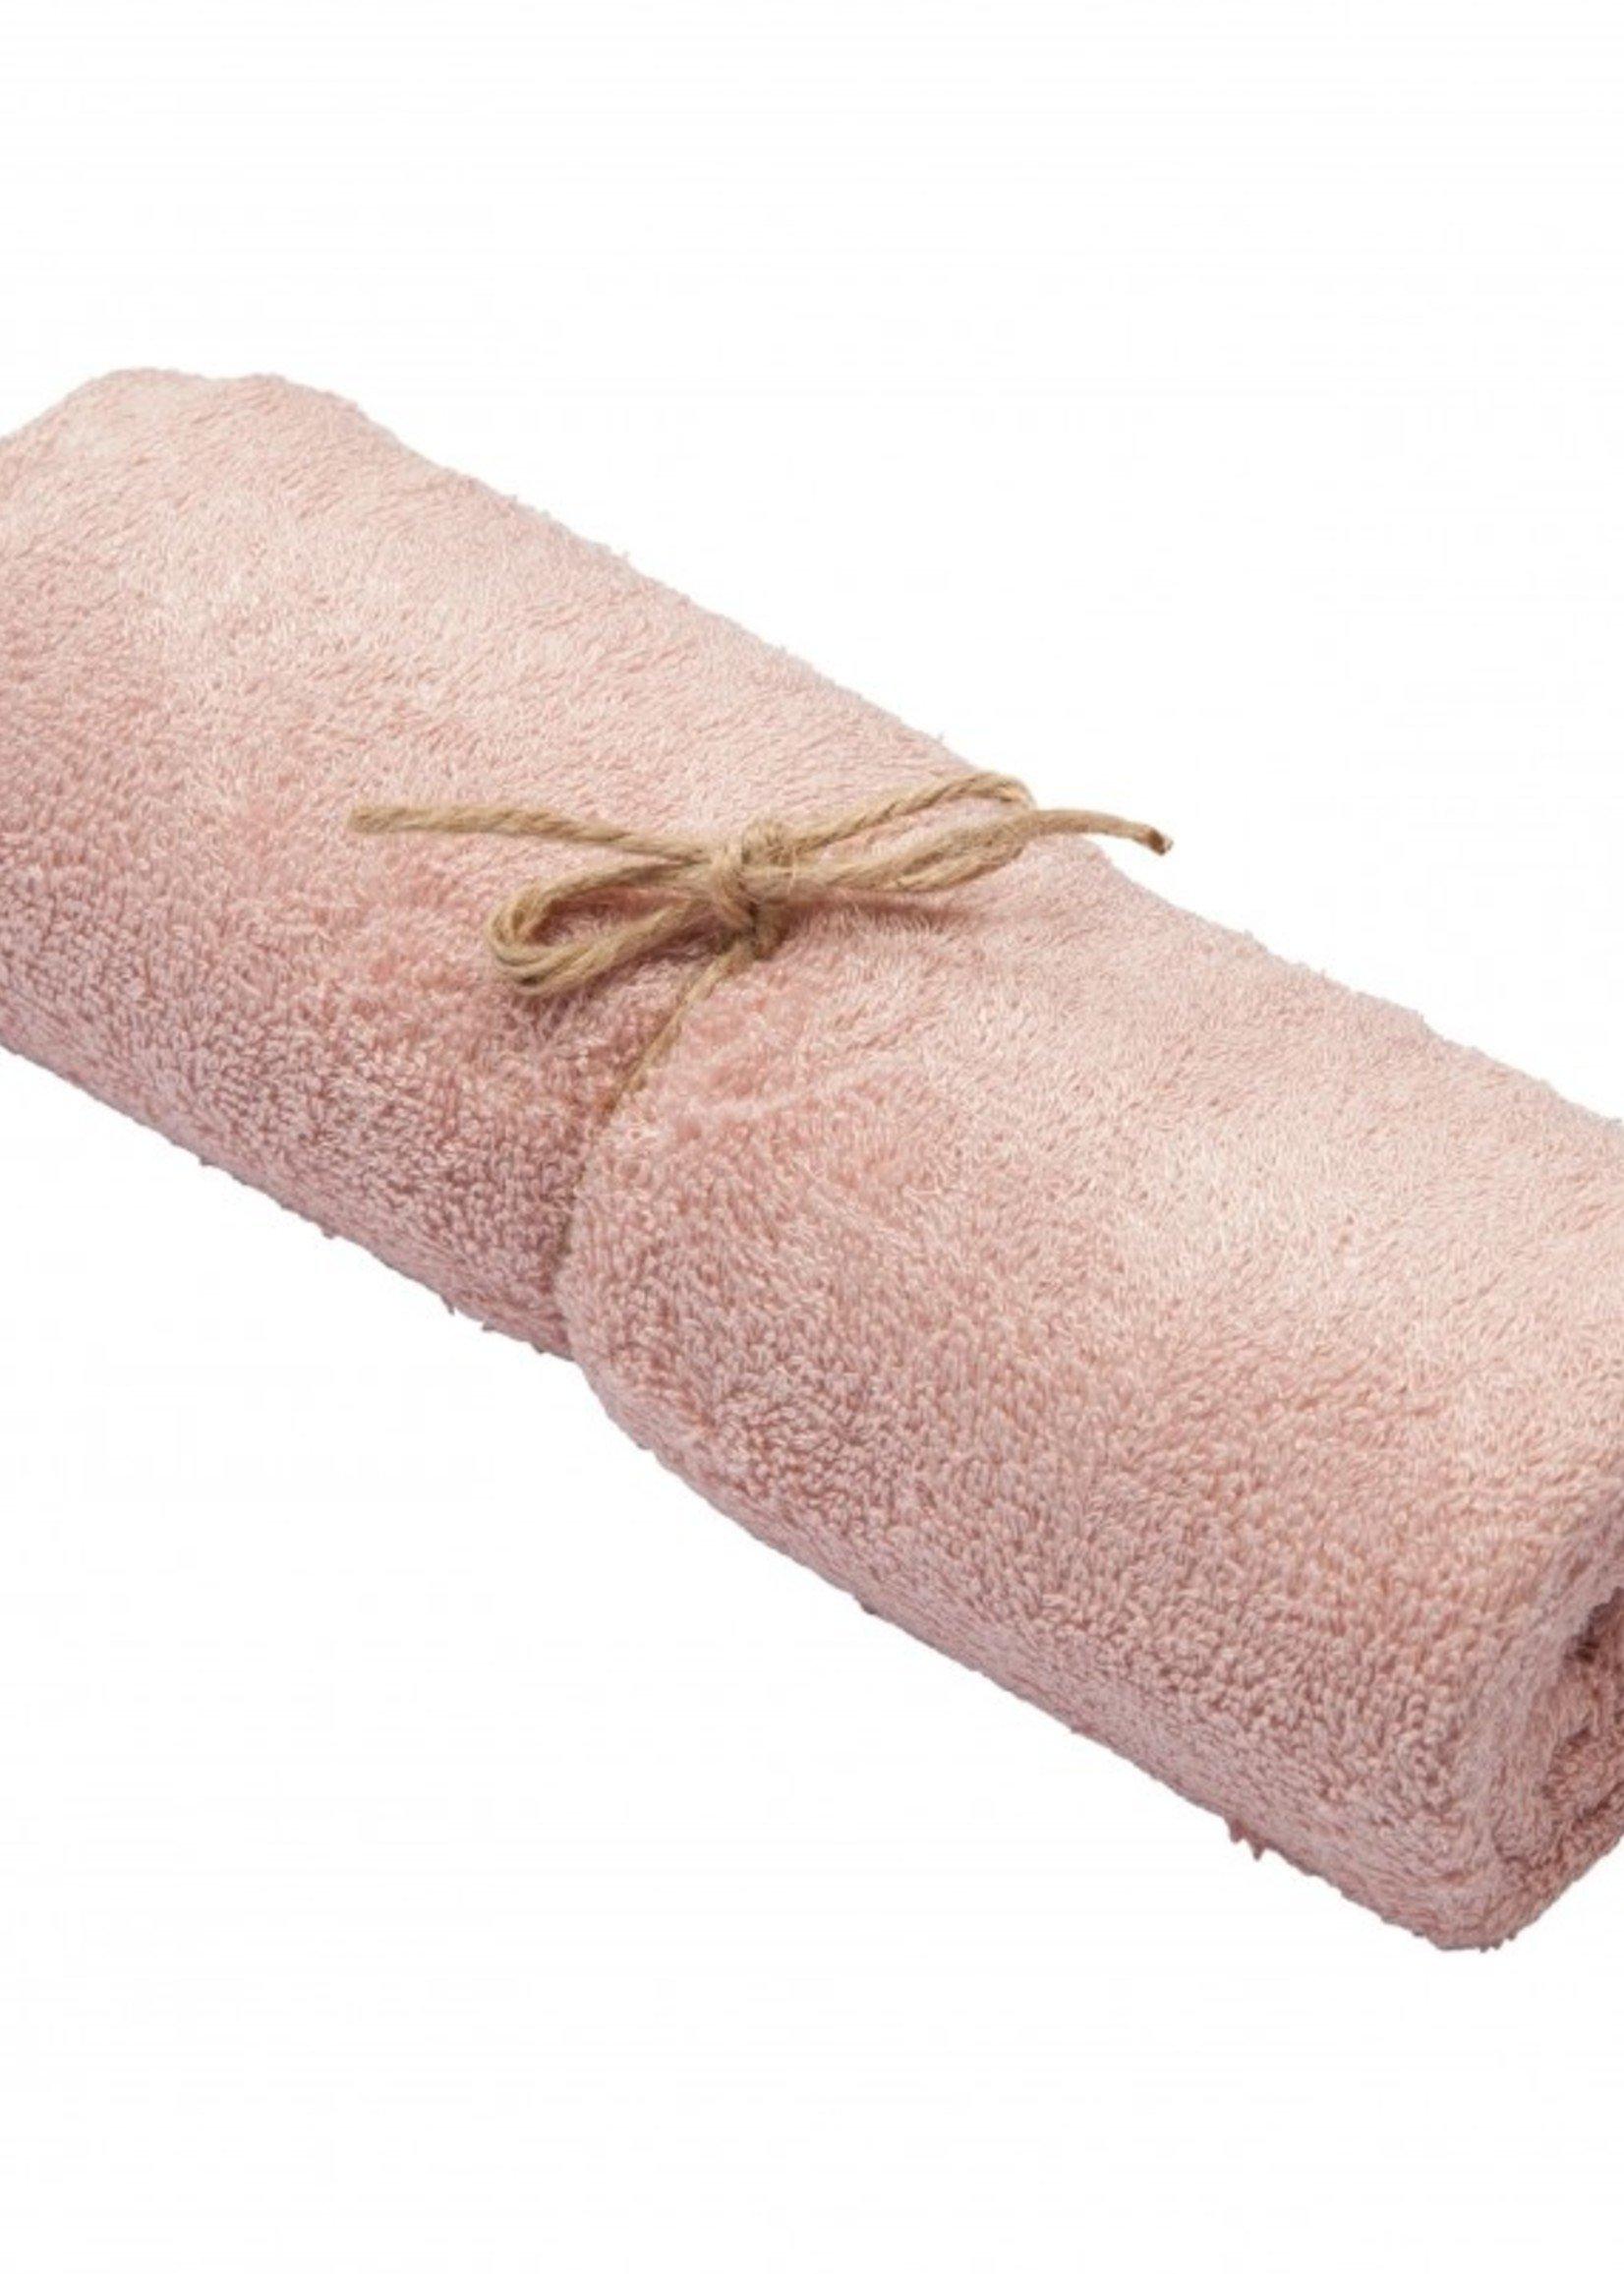 Timboo Towel 74x110 cm Misty Rose